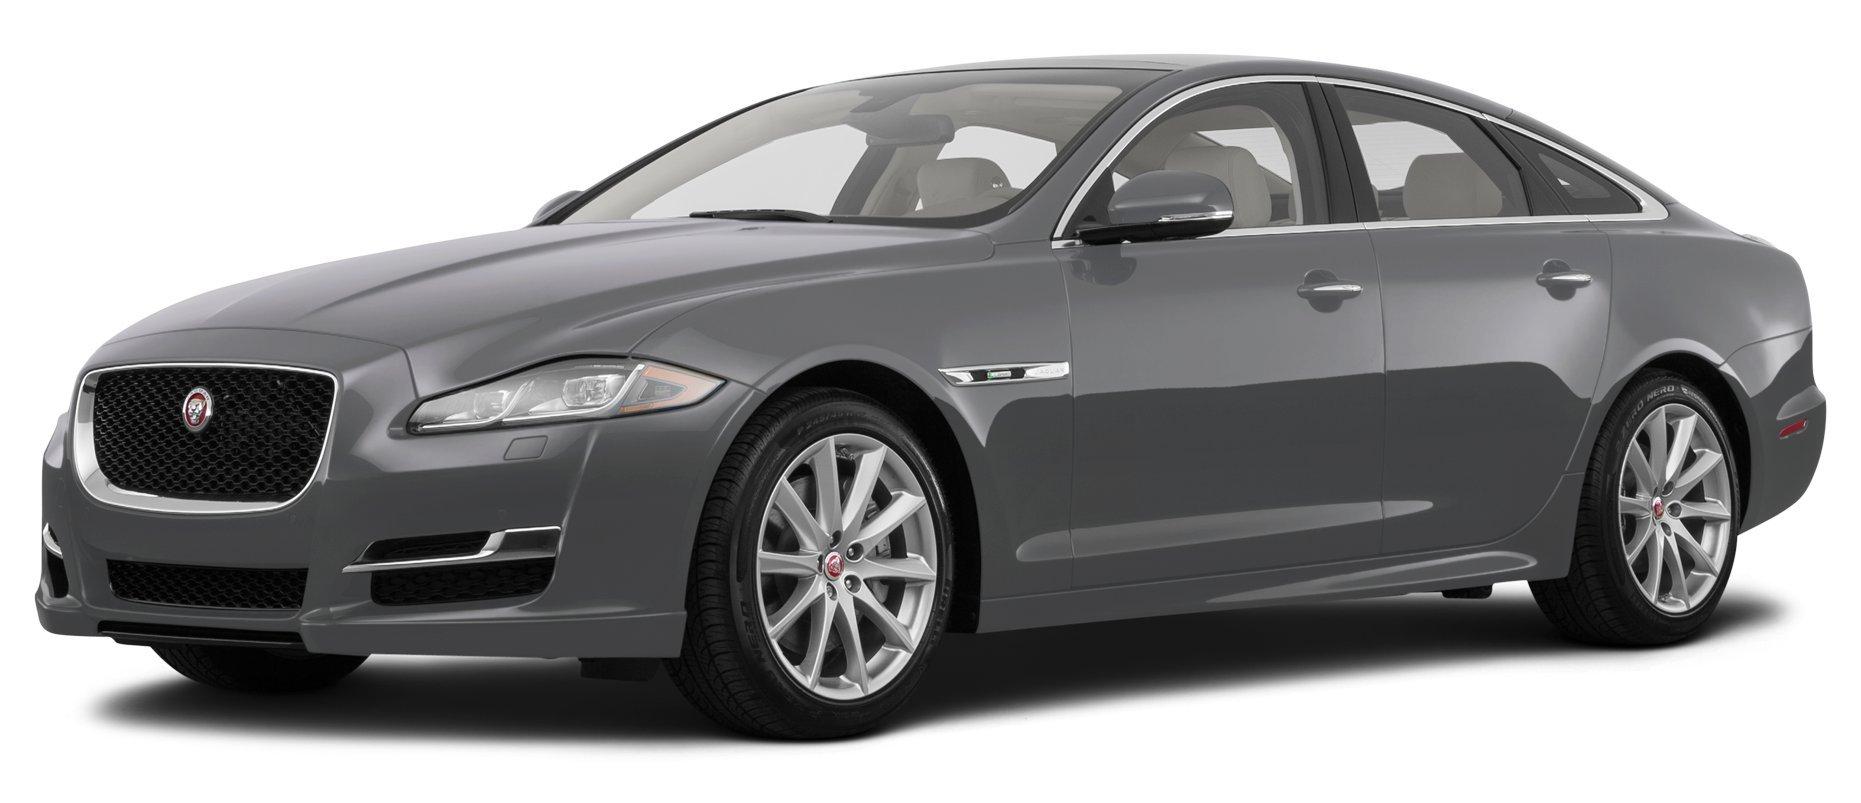 Image result for 2017 Jaguar XJ XJR Long Wheelbase RWD